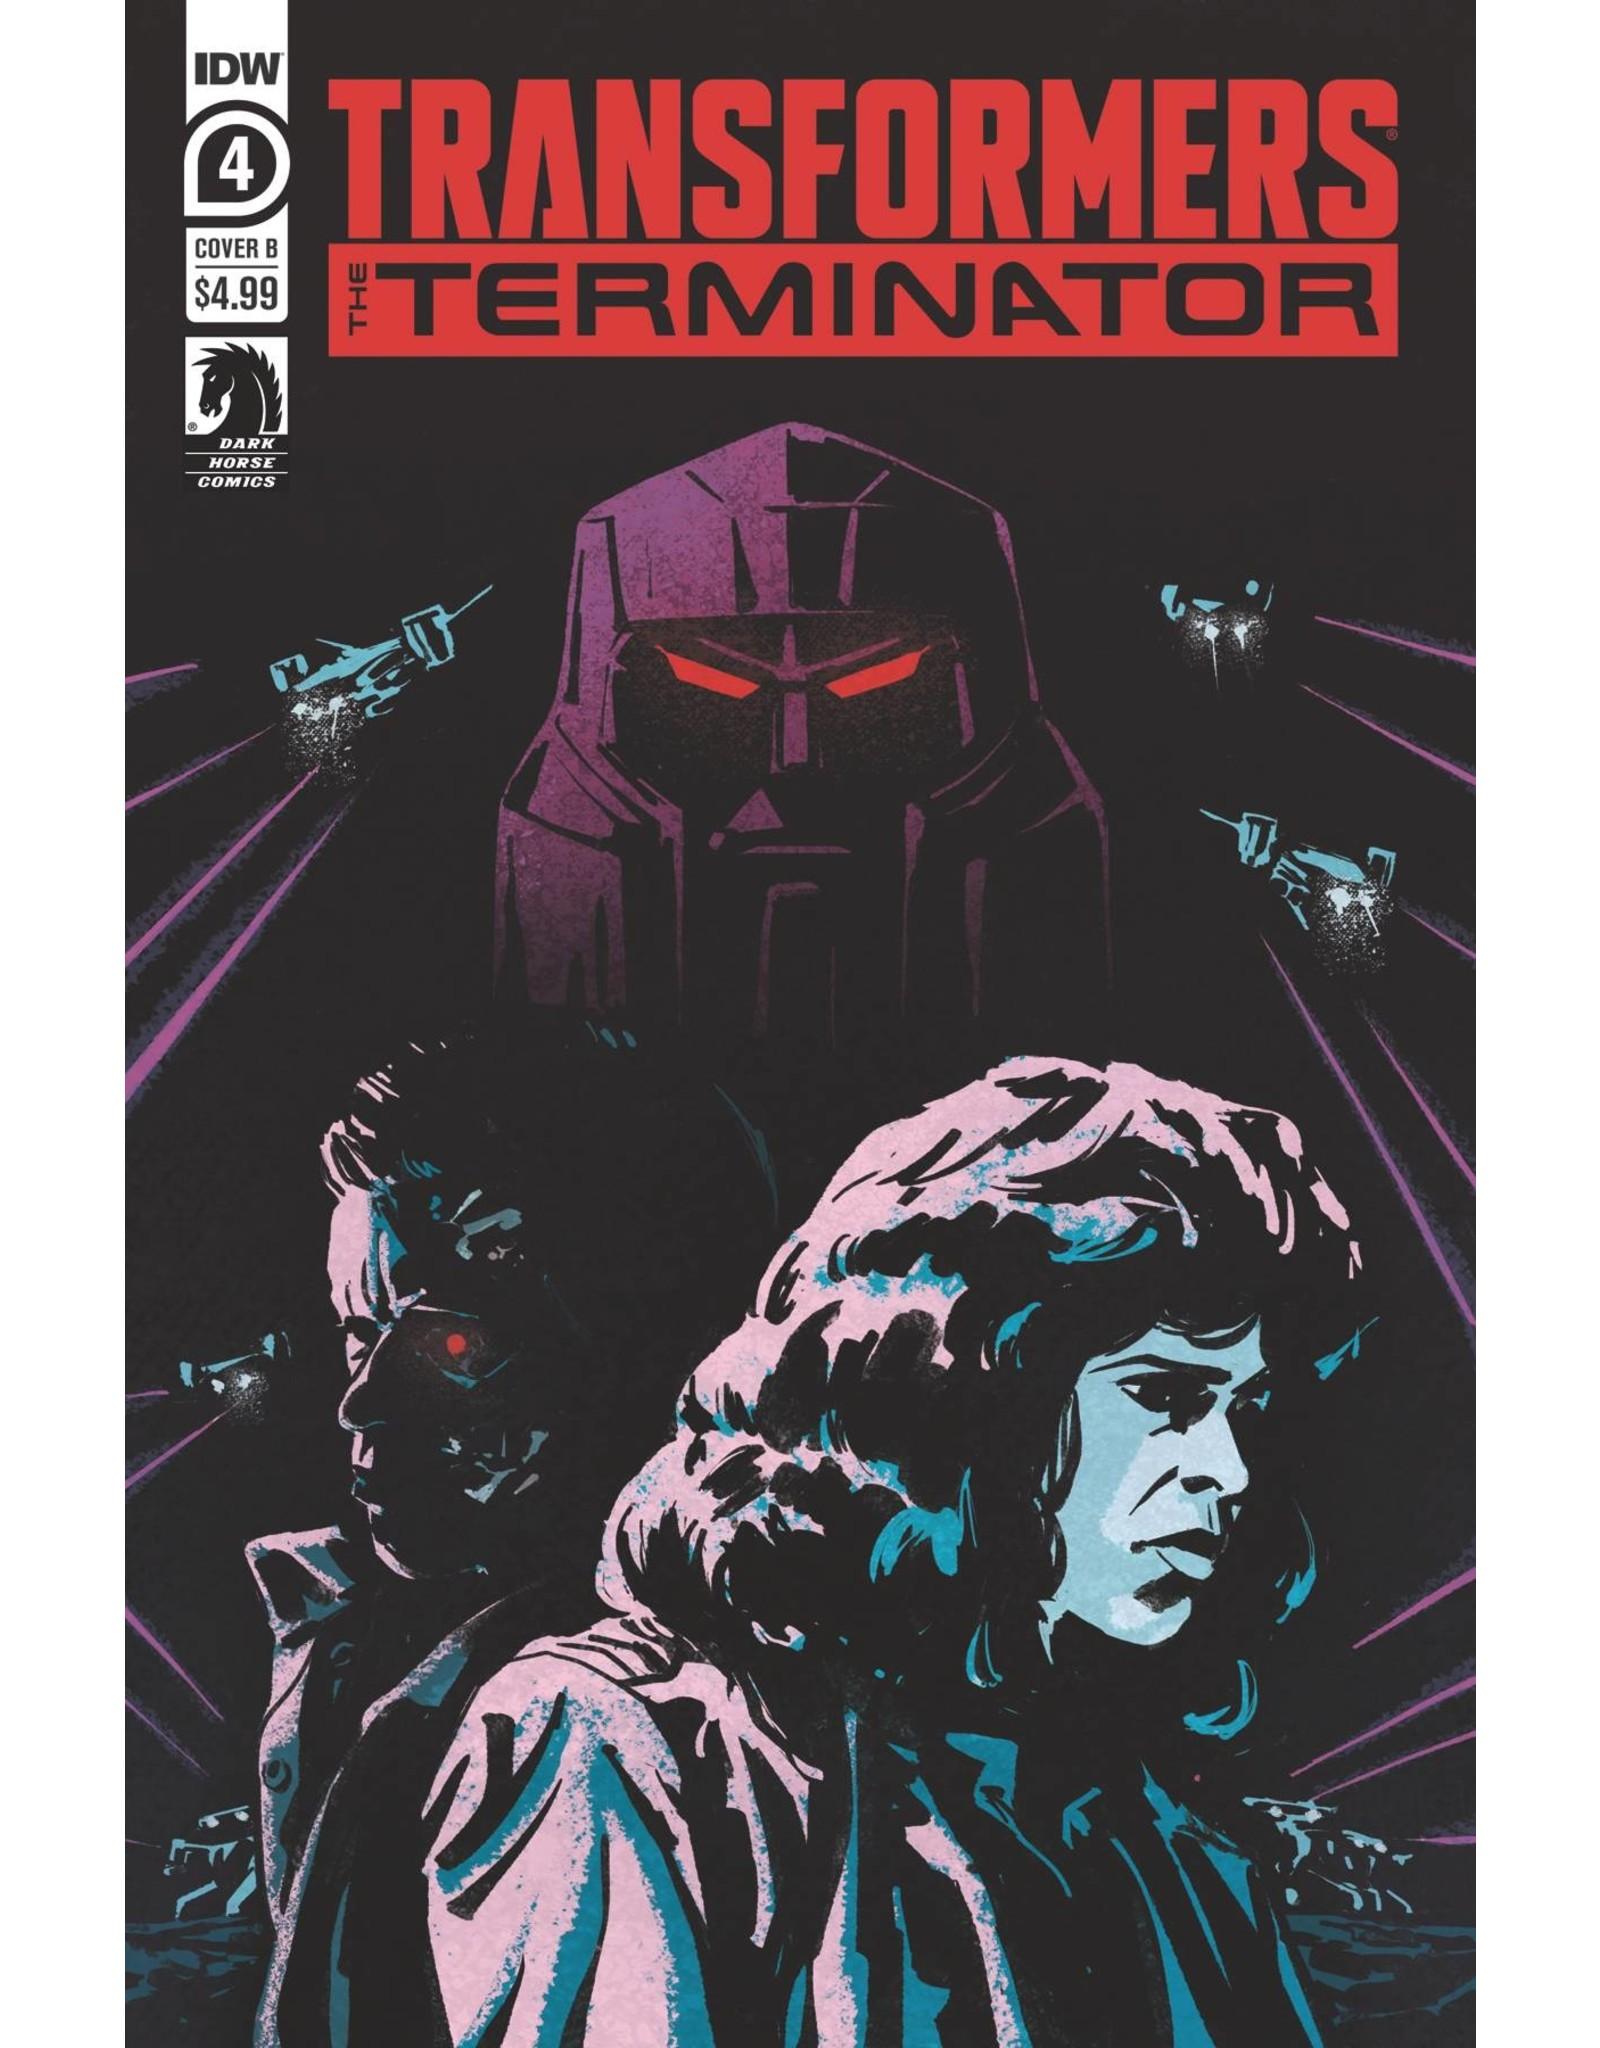 IDW PUBLISHING TRANSFORMERS VS TERMINATOR #4 (OF 4) CVR A FULLERTON